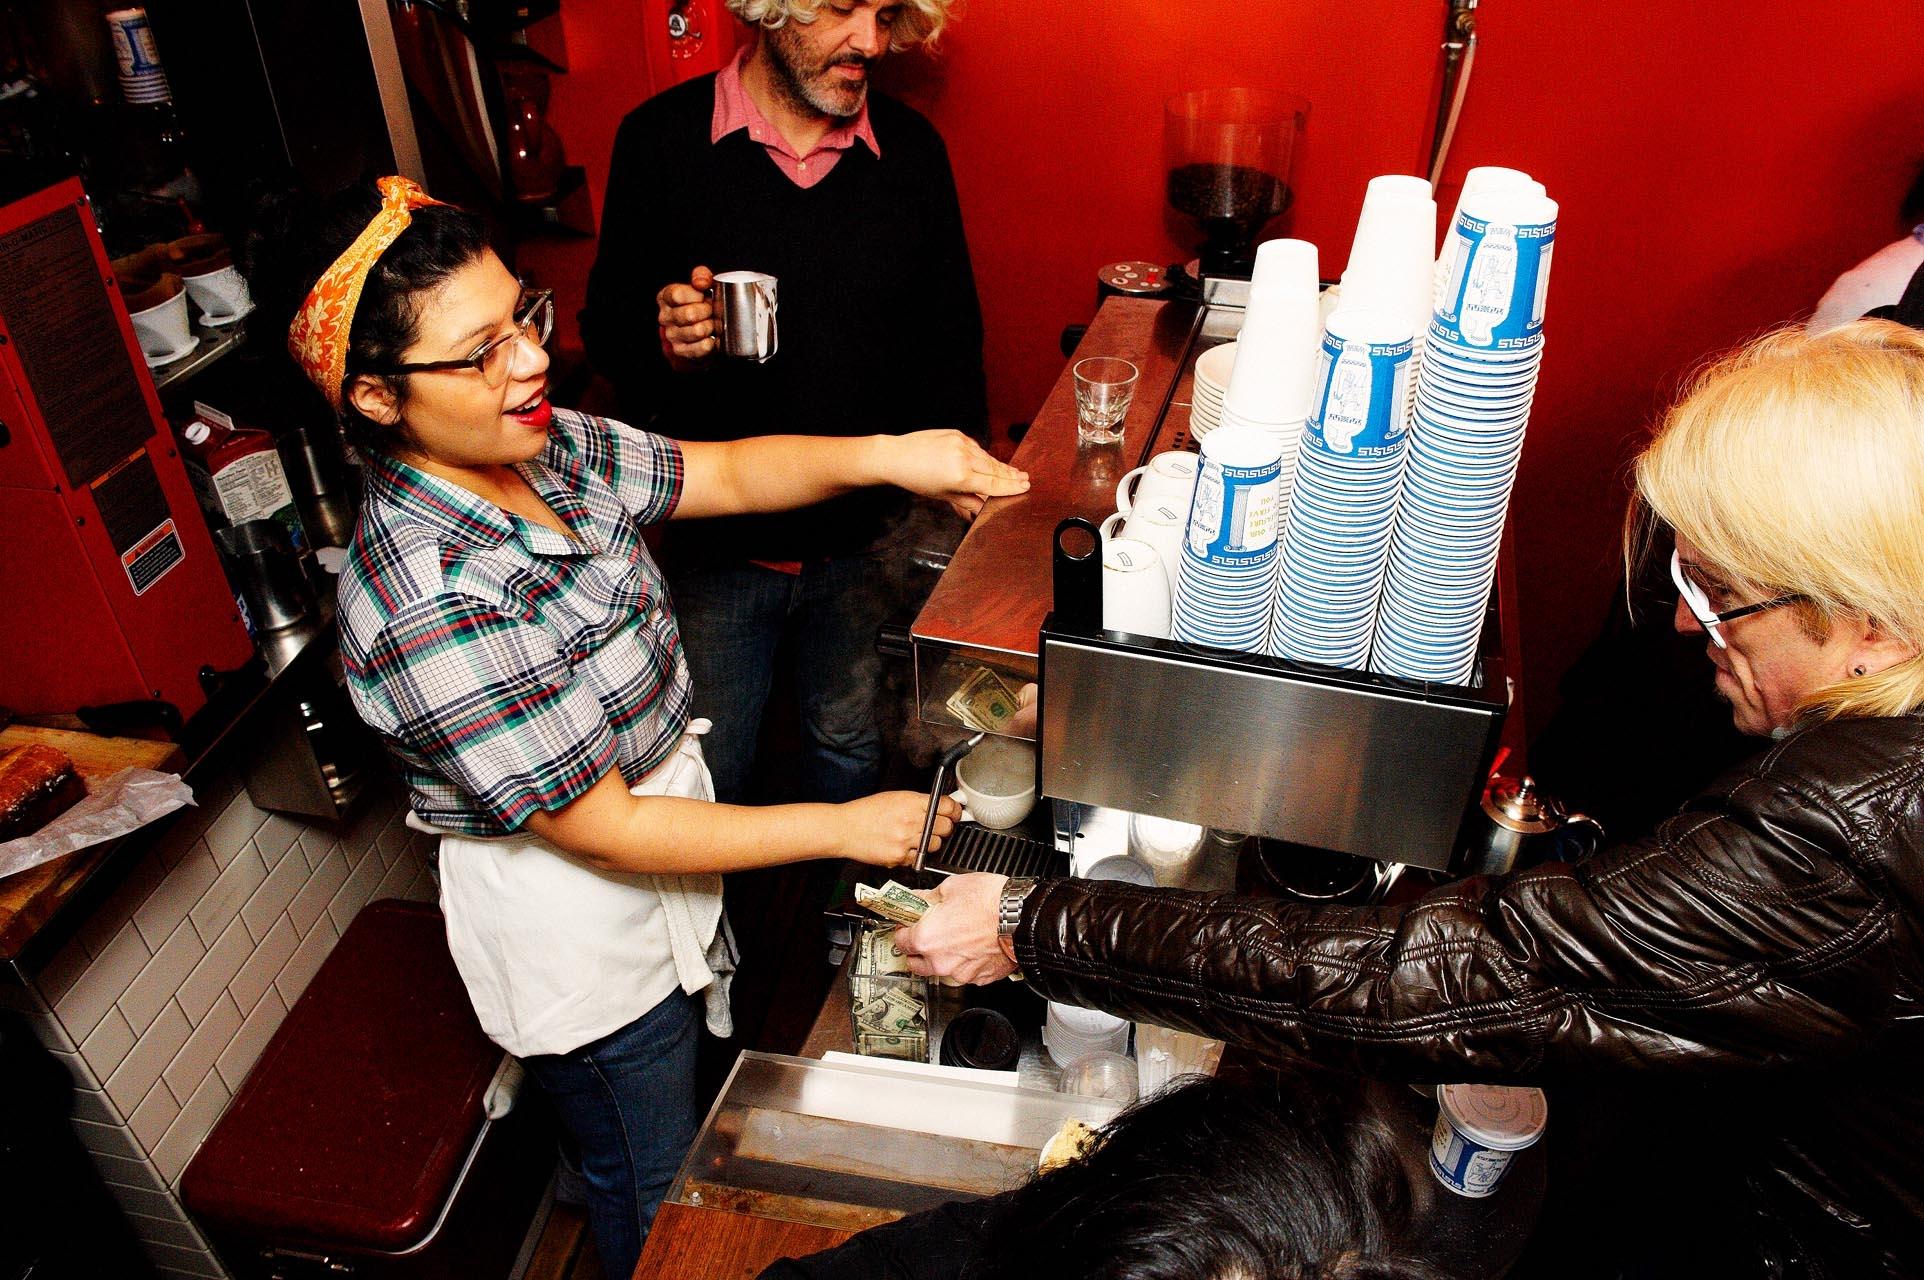 Abraco nyc inside barista